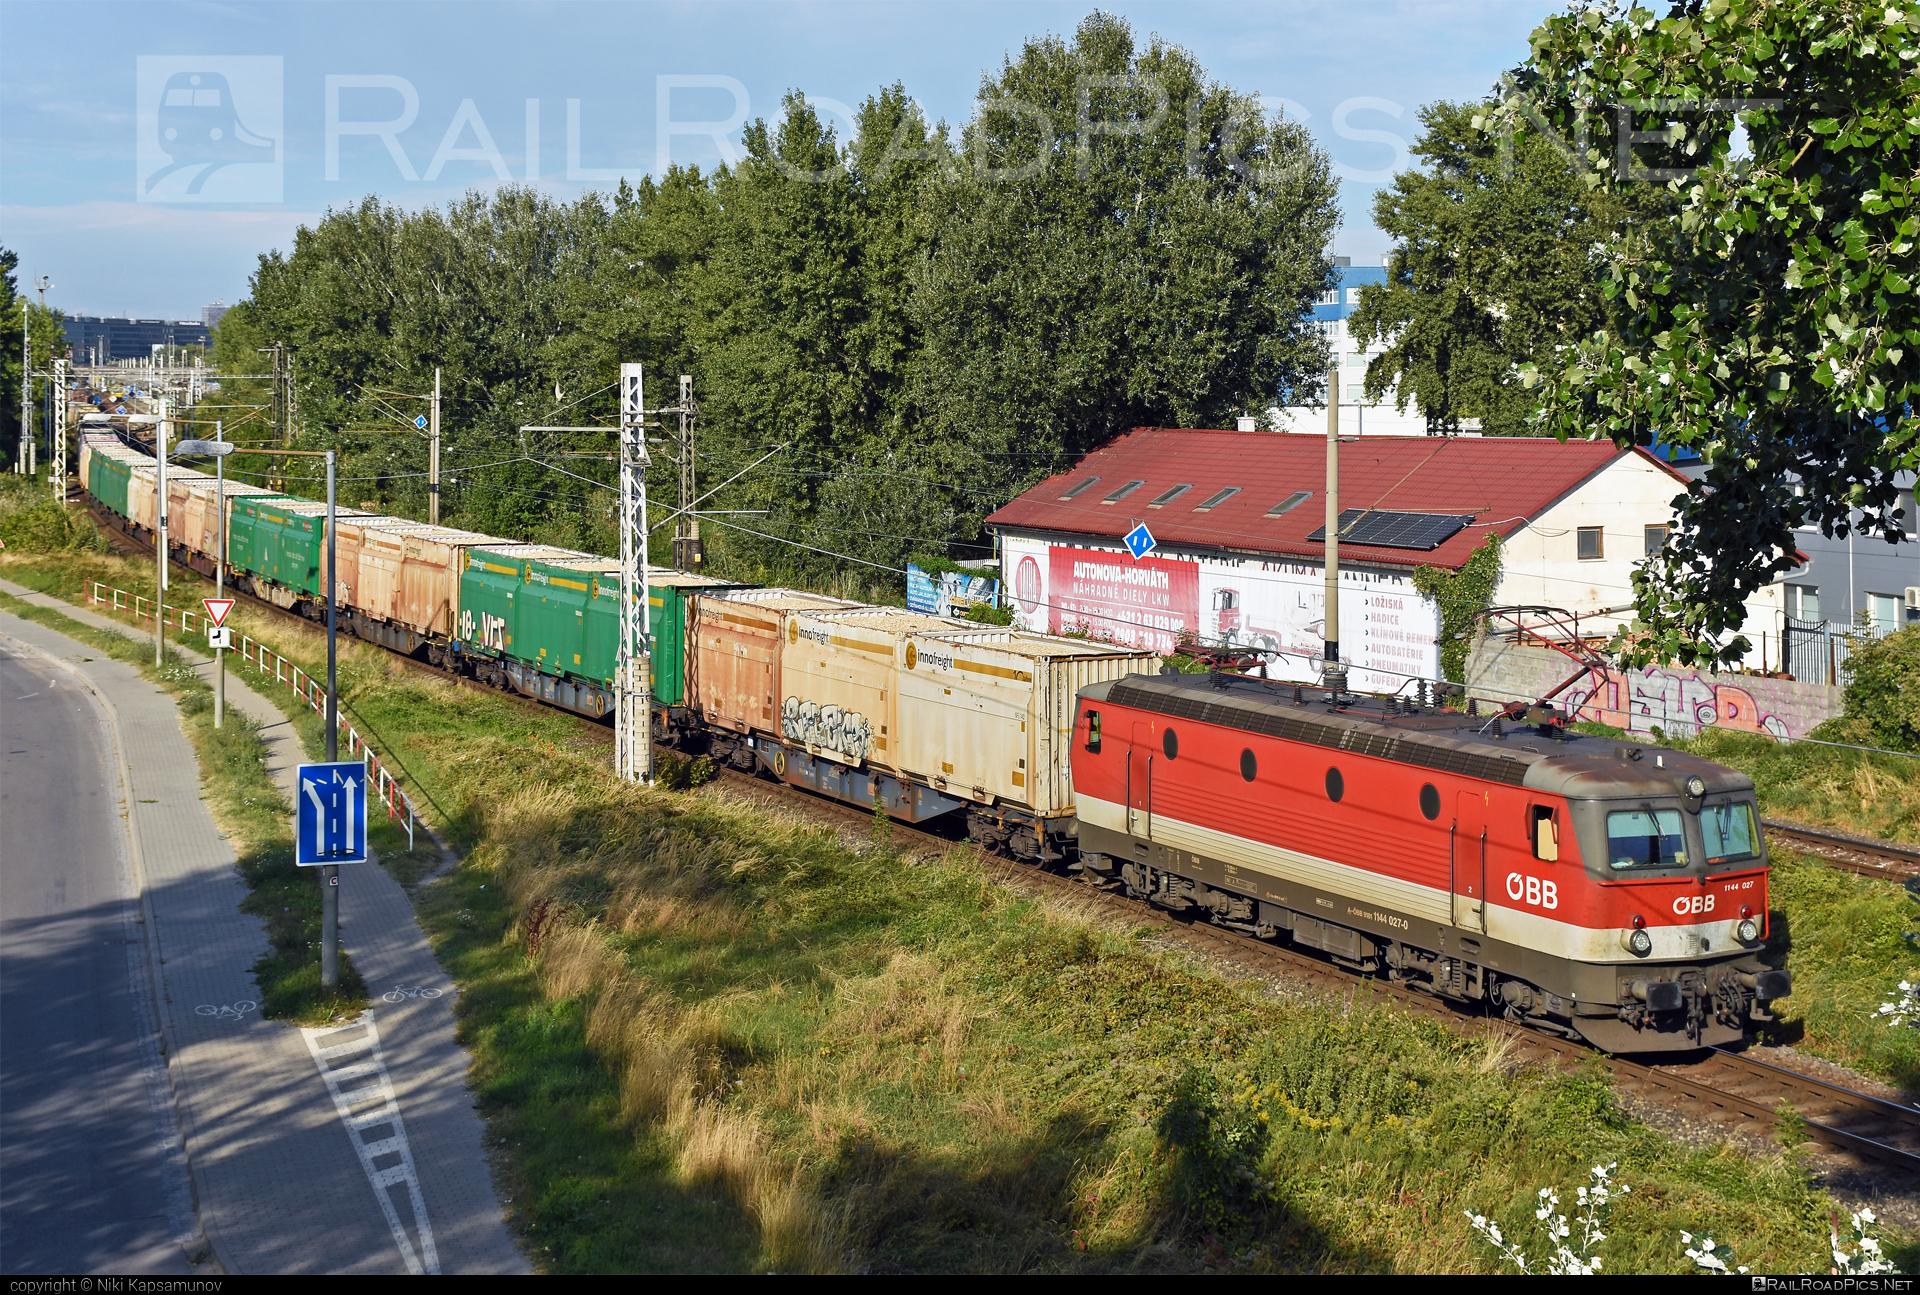 SGP ÖBB Class 1144 - 1144 027 operated by Rail Cargo Austria AG #flatwagon #obb #obbclass1144 #osterreichischebundesbahnen #rcw #sgp #sgp1144 #simmeringgrazpauker